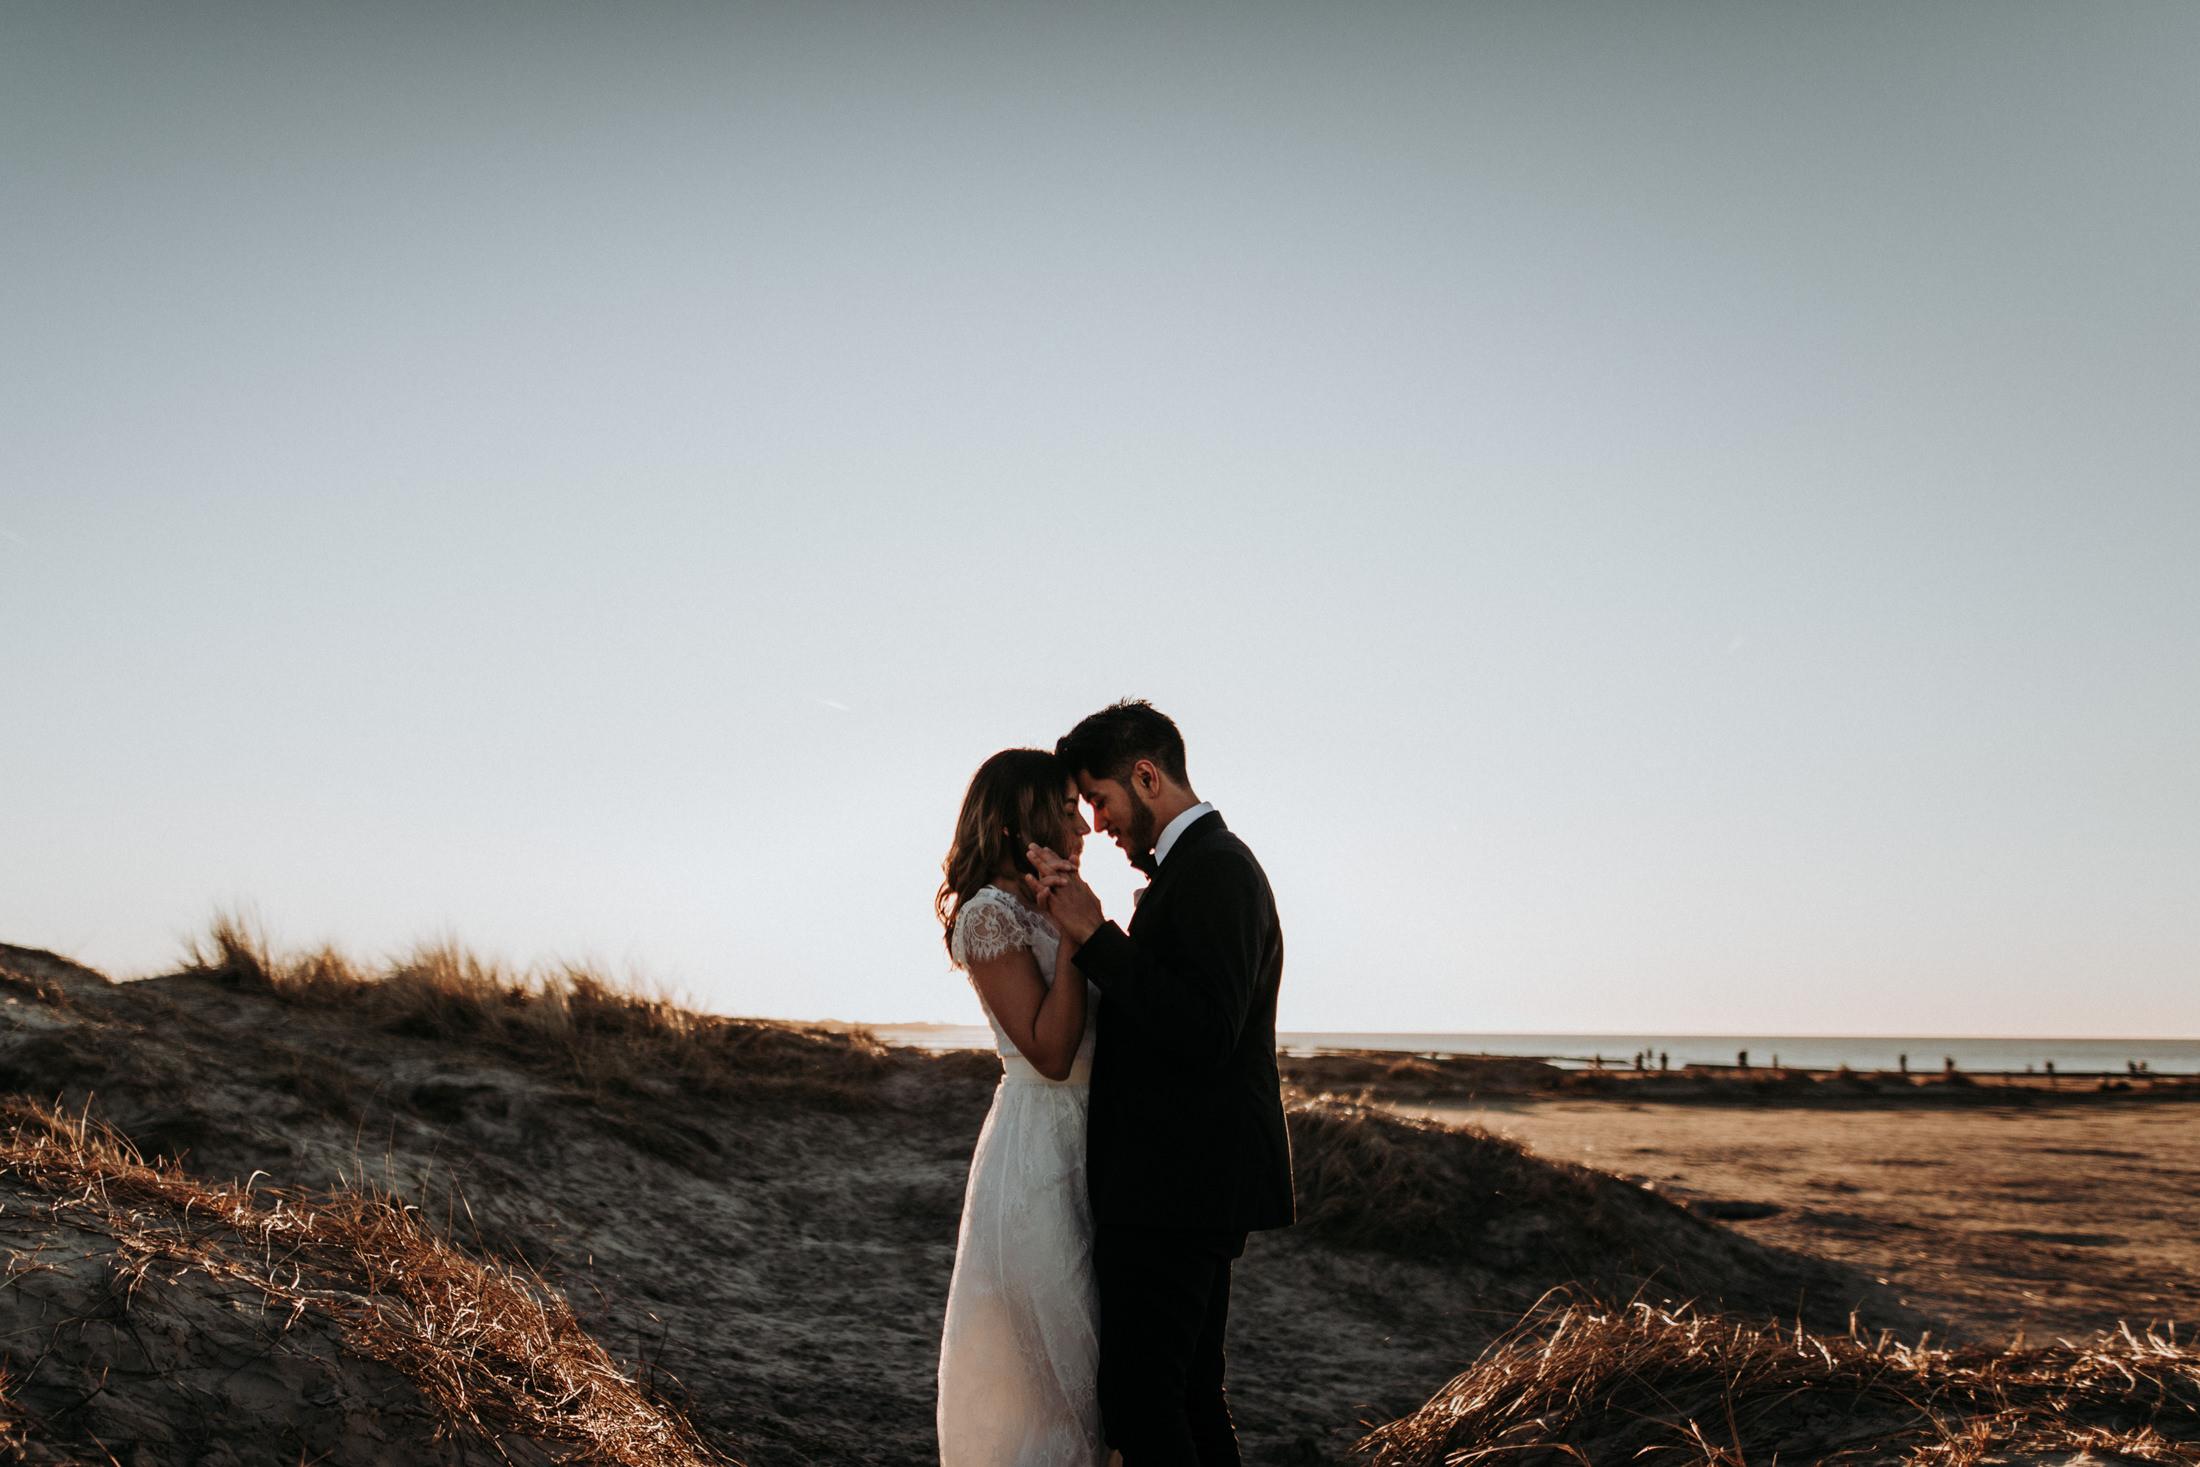 Wedding_Photographer_Mallorca_Daniela-Marquardt_Photography_CanaryIslands_Lanzarote_Iceland_Tuskany_Santorini_Portugal_Schweiz_Austria_Bayern_Elopement_Hochzeitsfotograf_Norddeichich_32